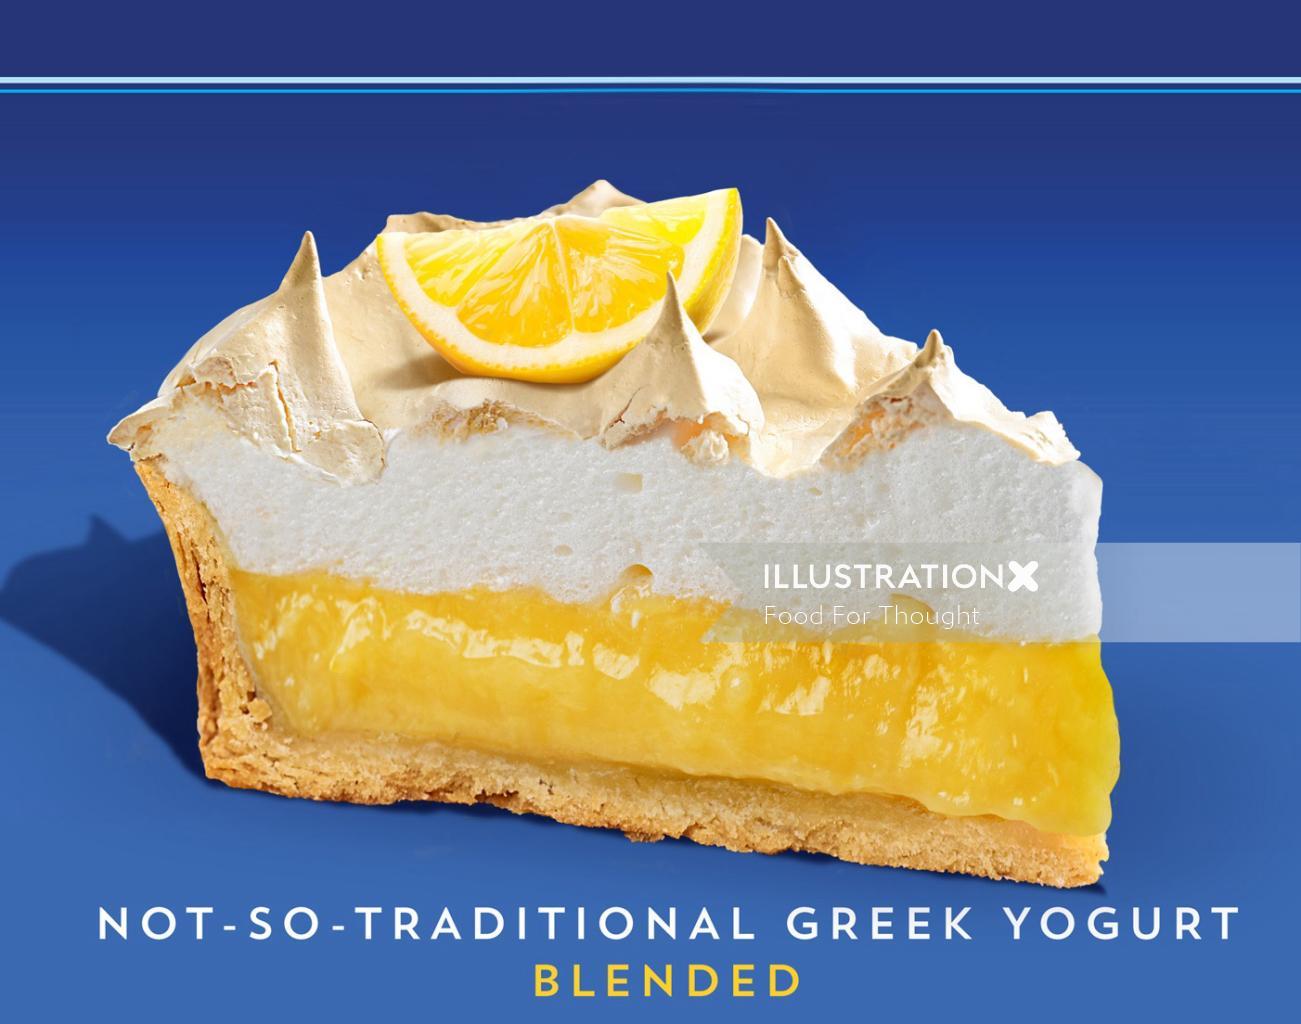 Packaging illustration for Oikos luxury yogurt